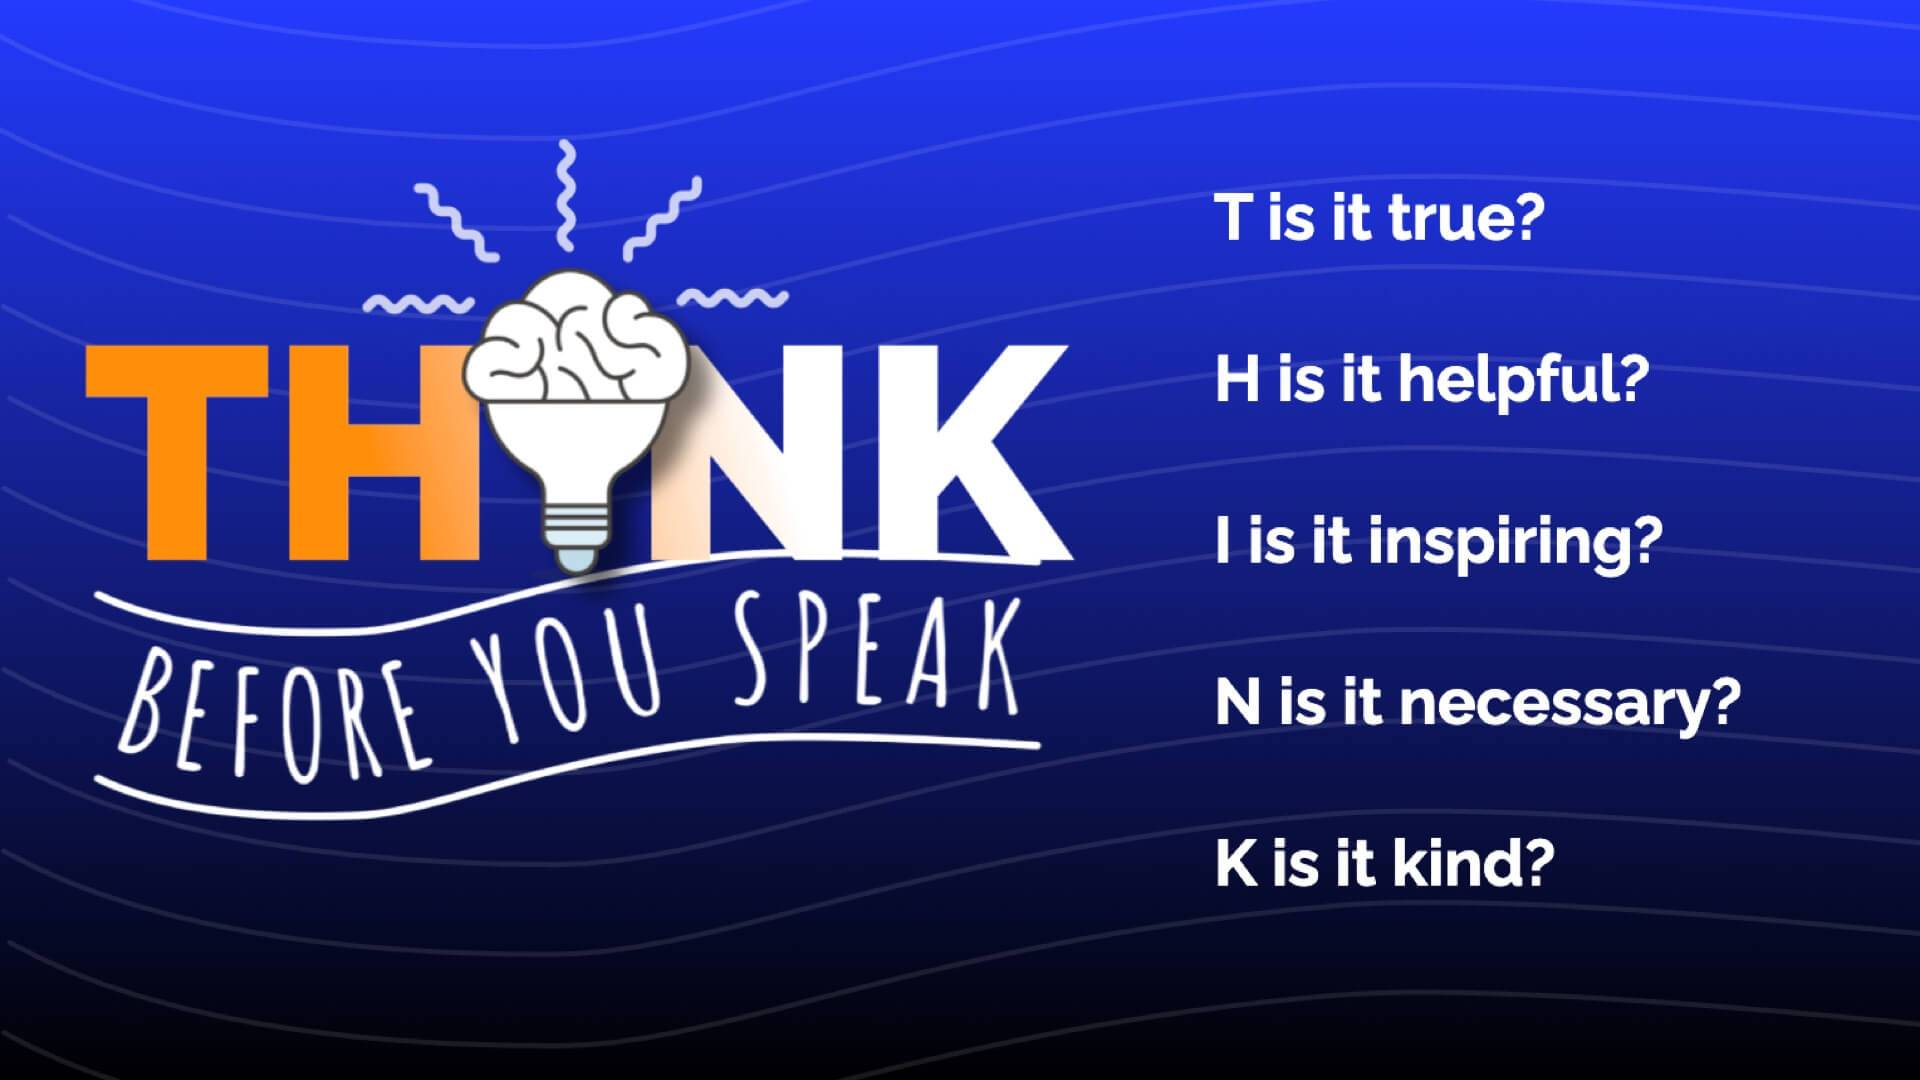 Think Before You Speak Digital Signage Template